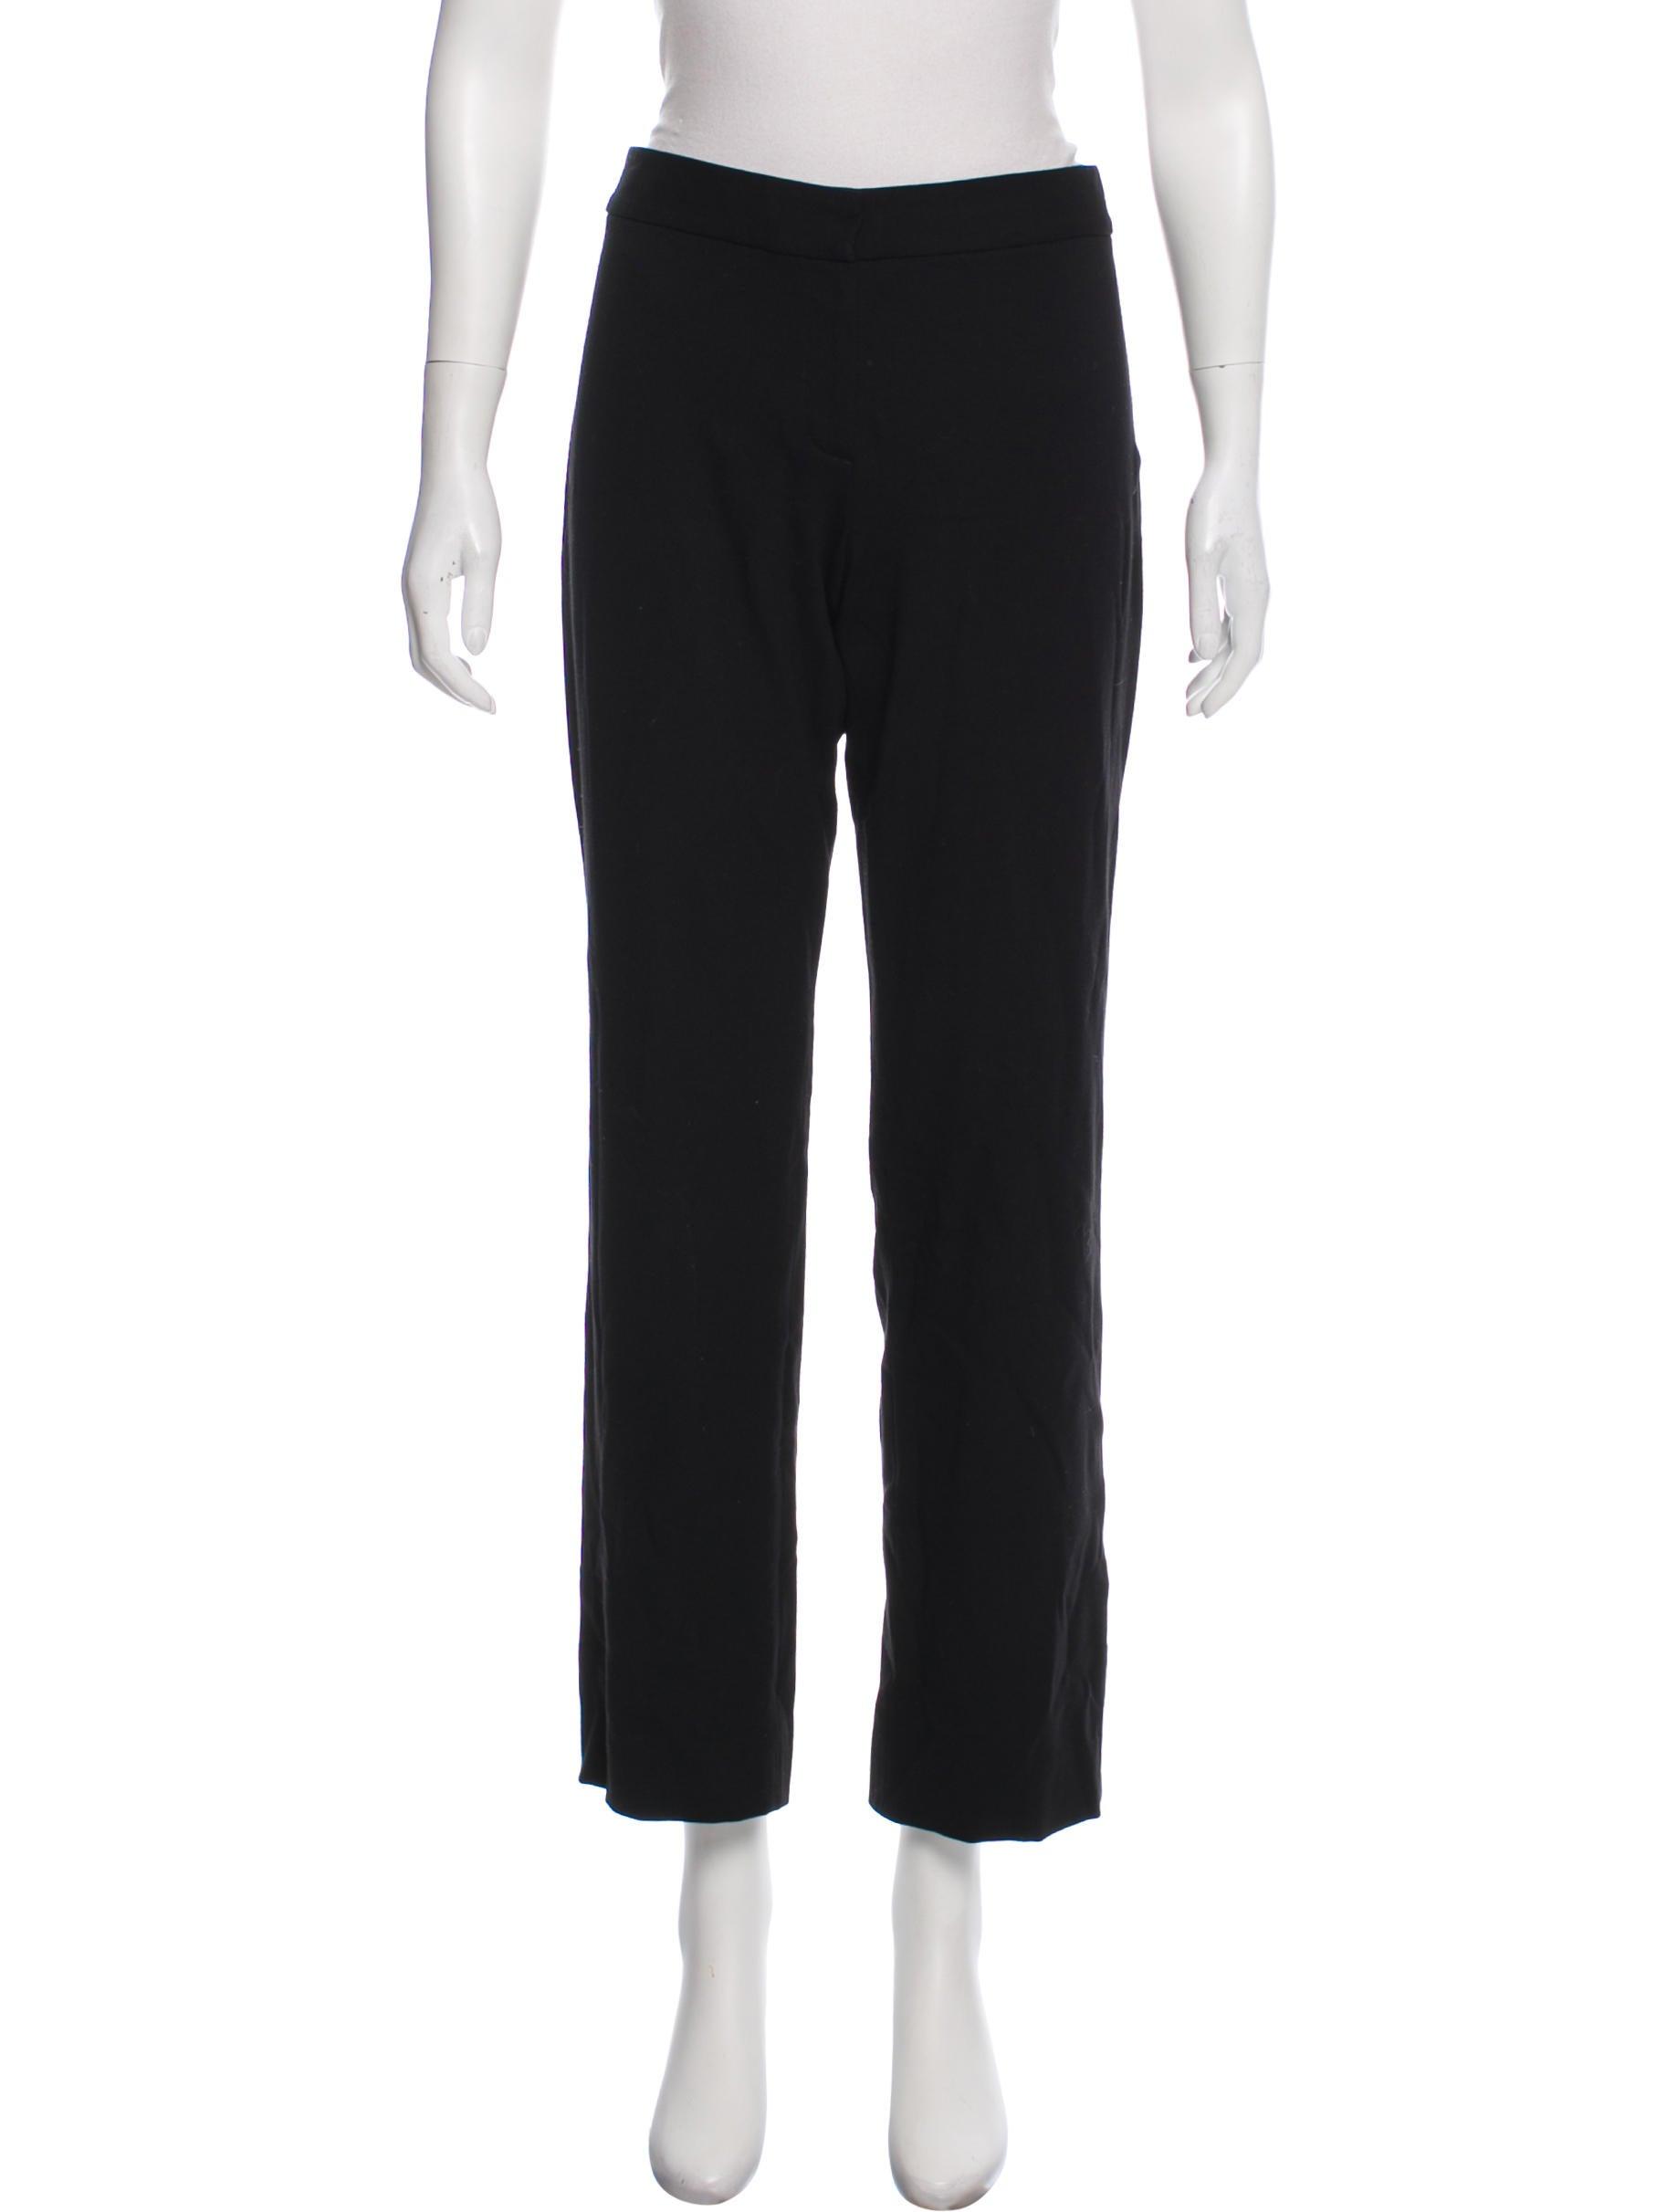 09e2fa18545e7 Elie Tahari Mid-Rise Straight-Leg Pants - Clothing - WEL24164